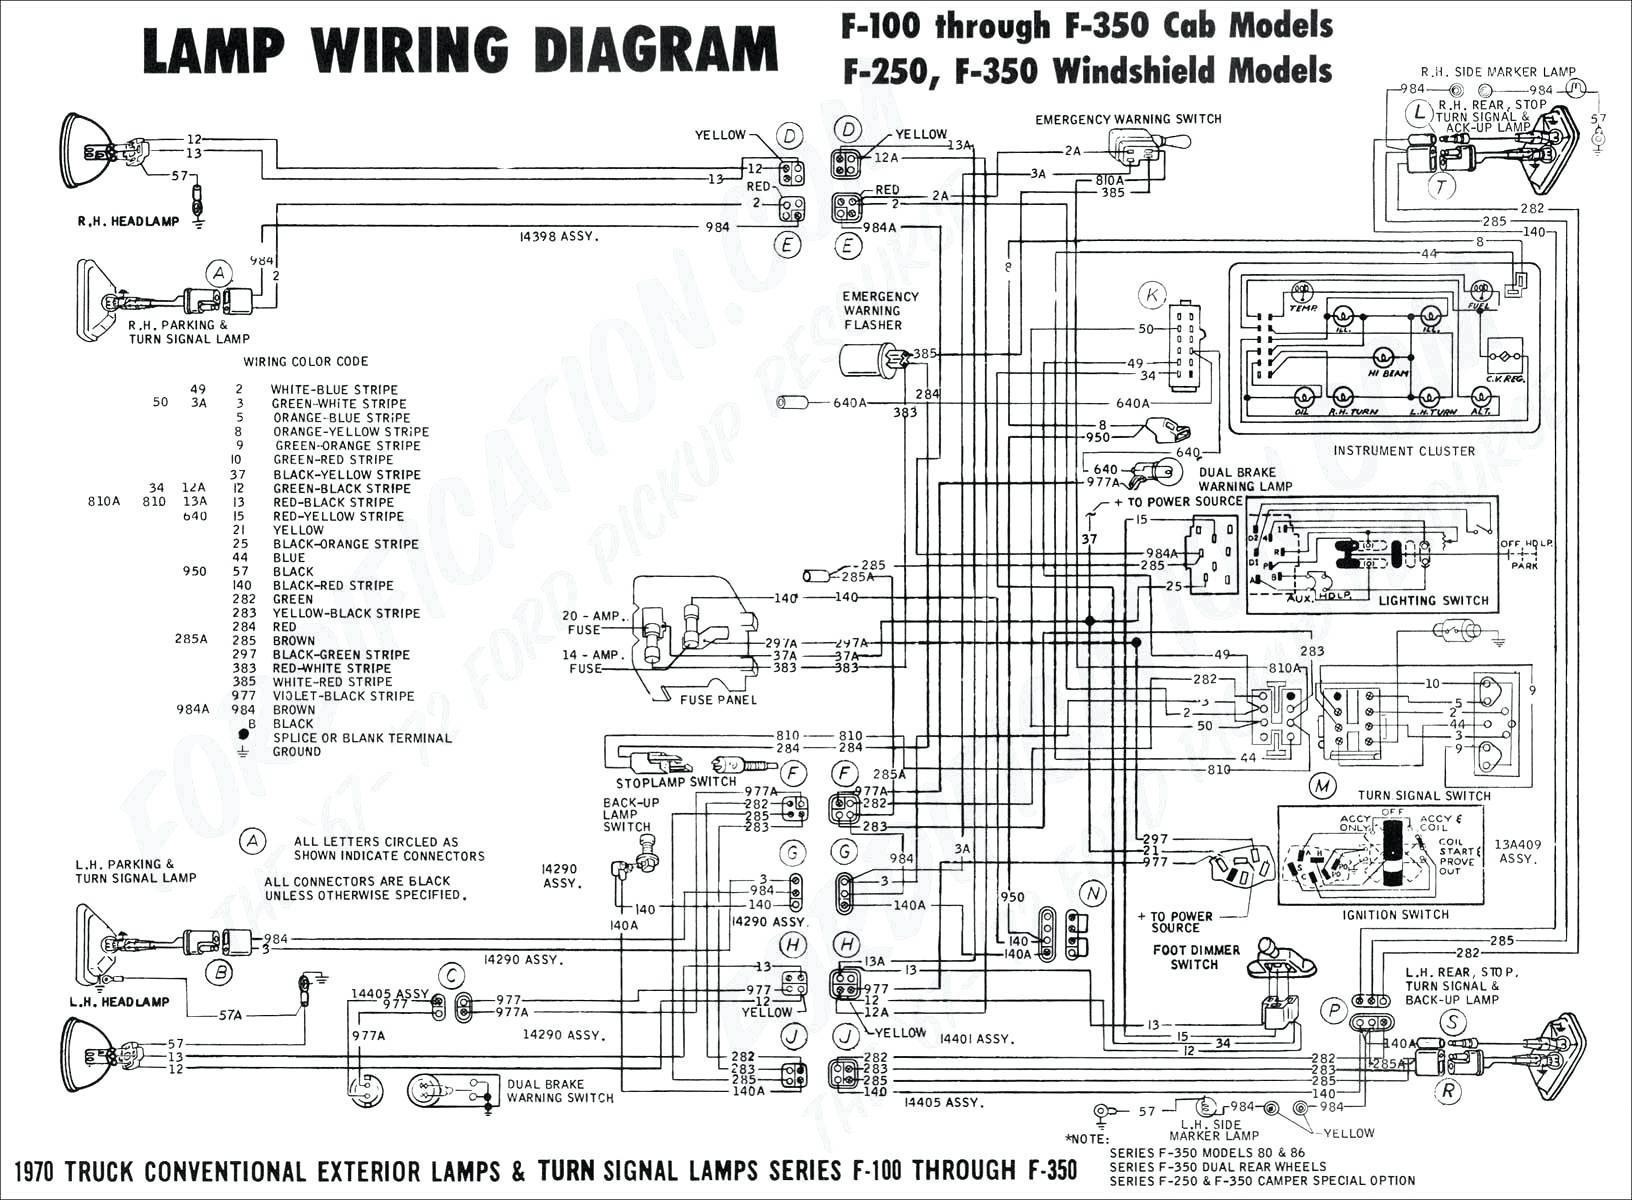 2000 malibu any diagrams on eletrical connections to sensorsv6 Chevy Malibu Radio Wiring